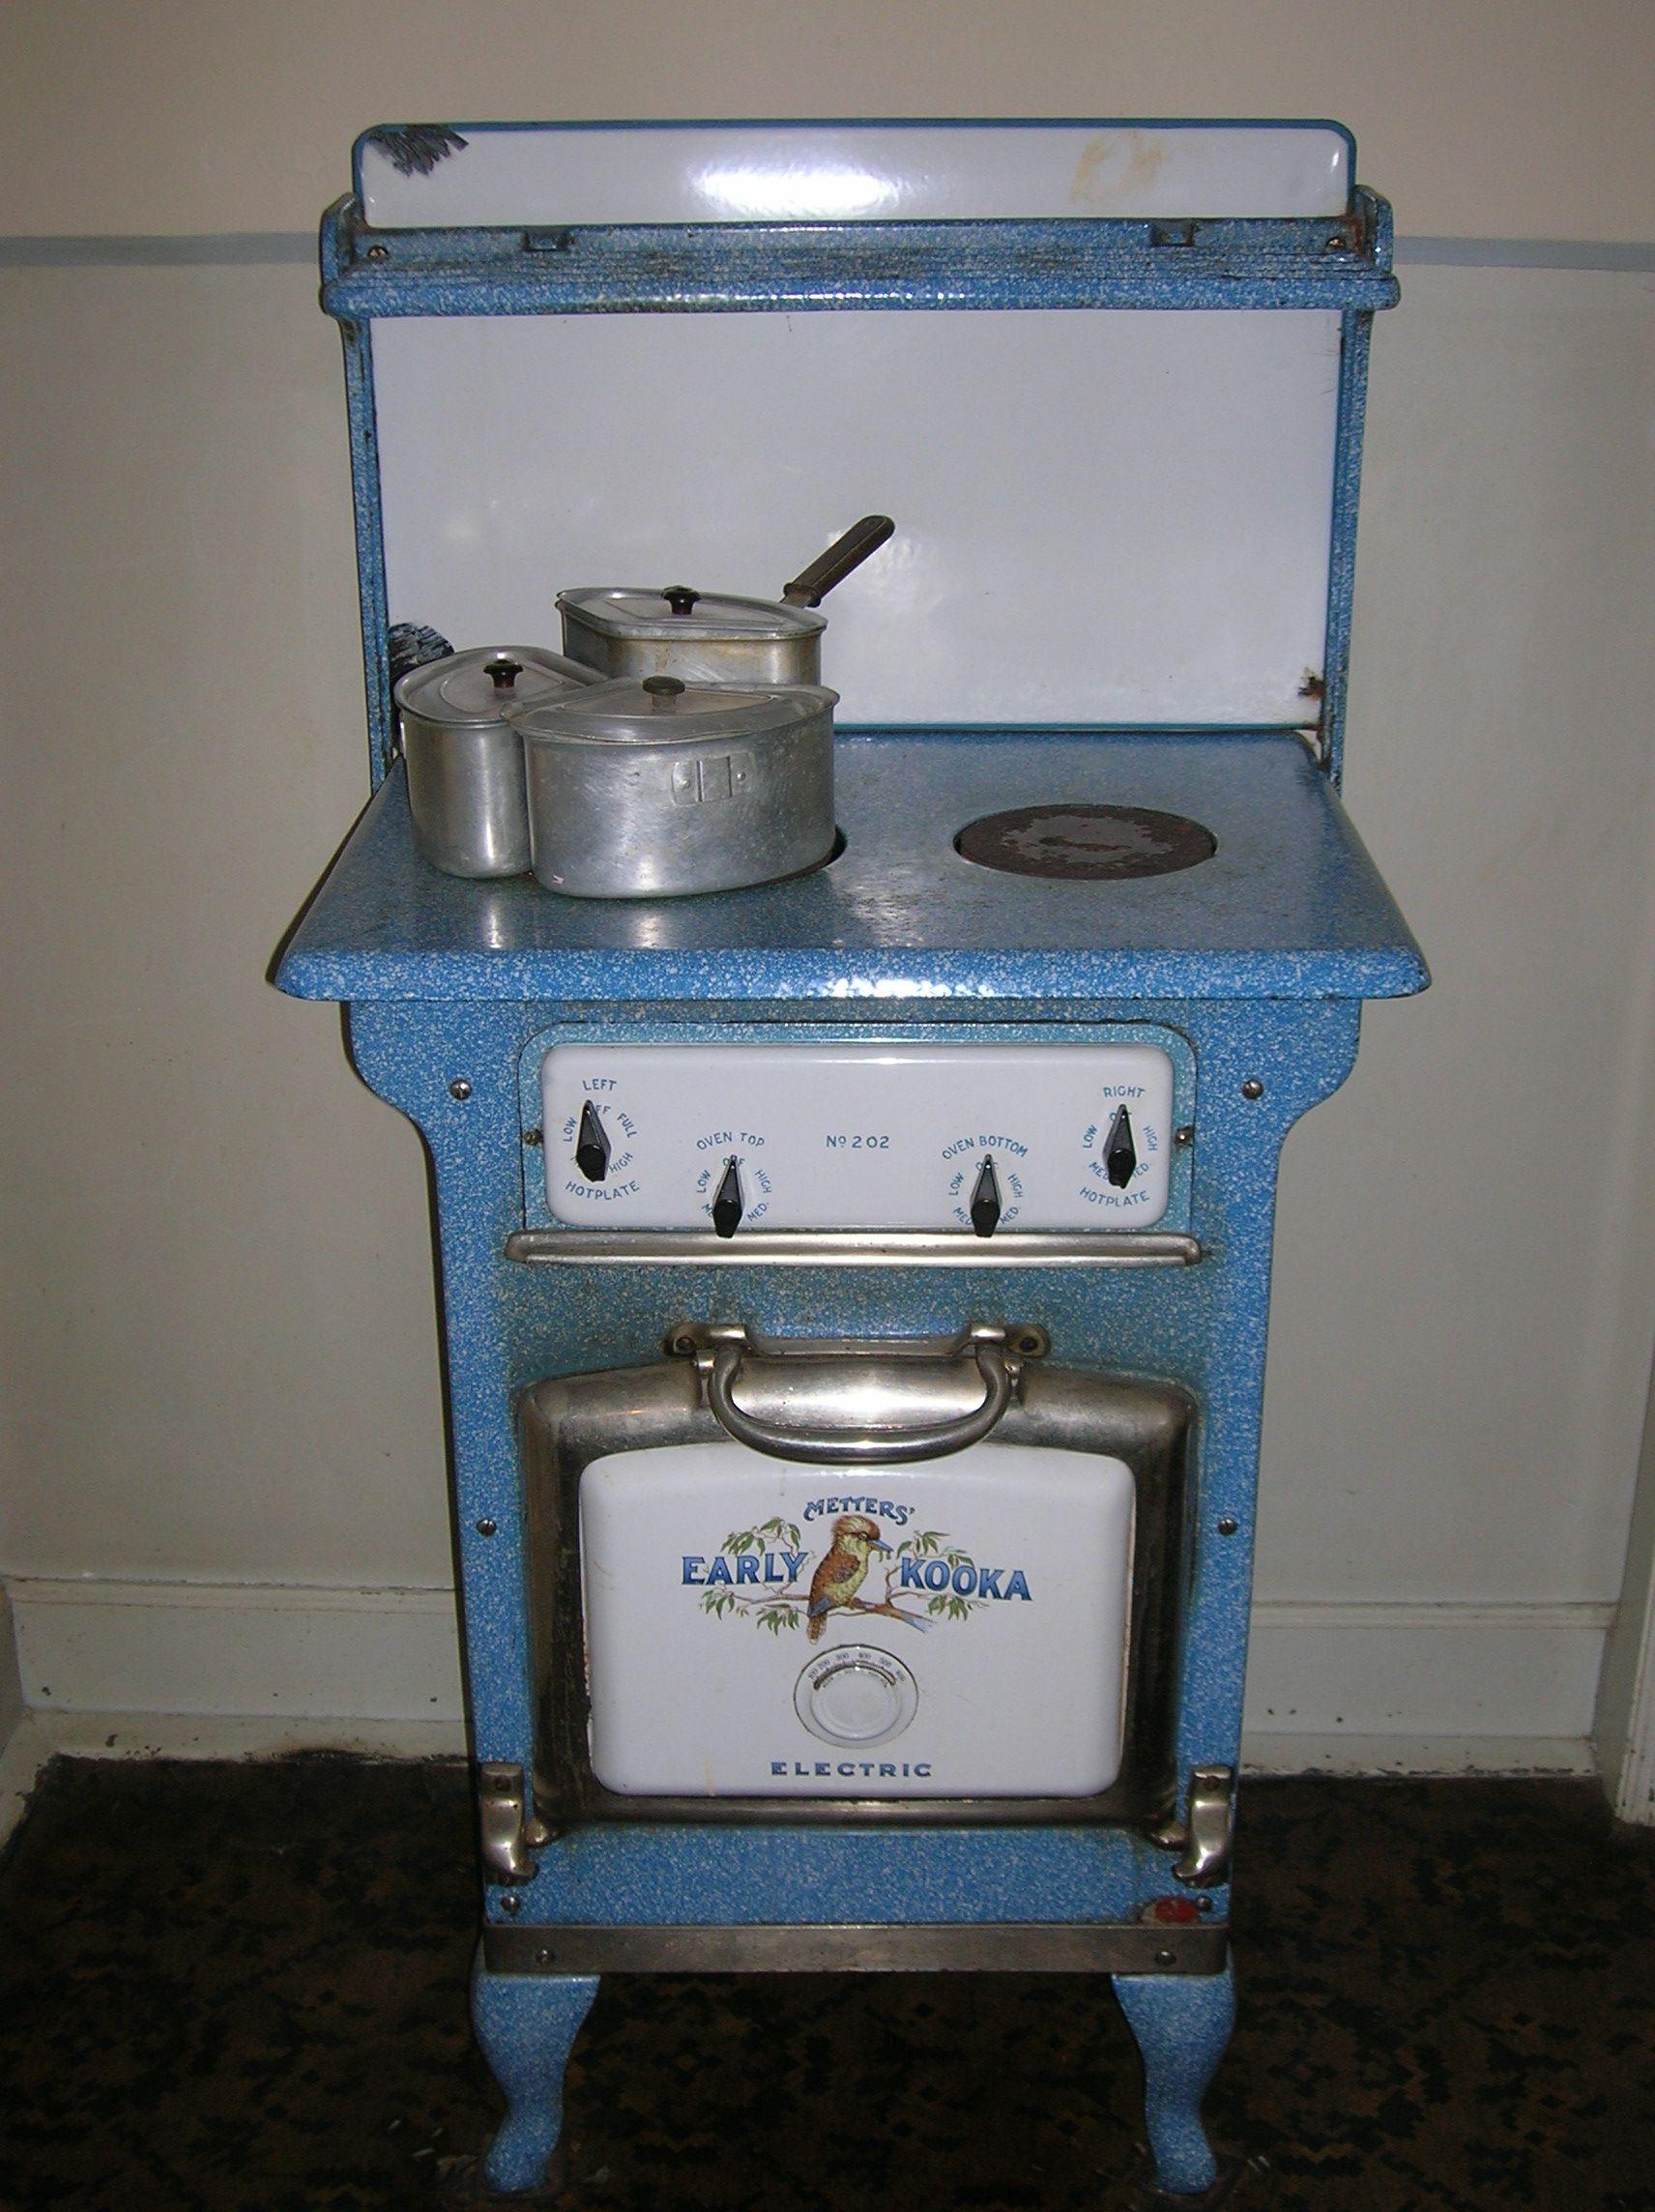 Vintage electric stove, Calthorpe House, Canberra, Australia ...